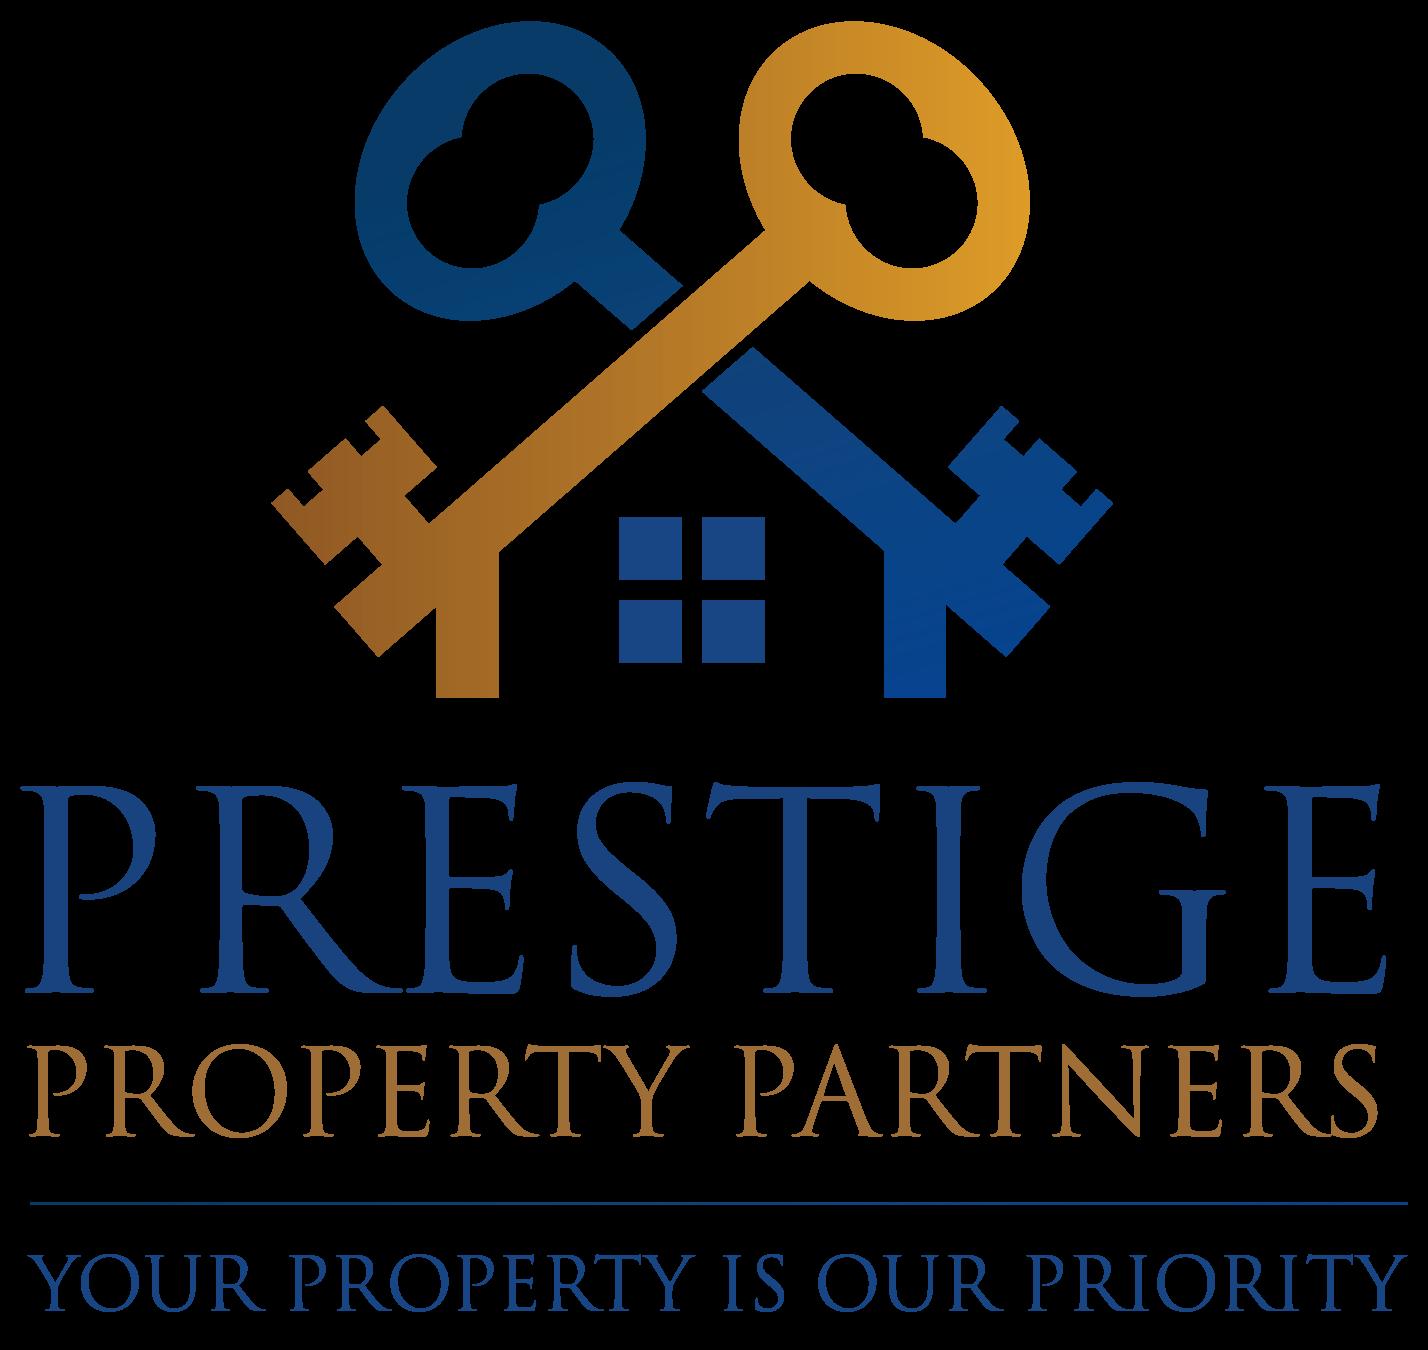 About Us Prestige Property Partners